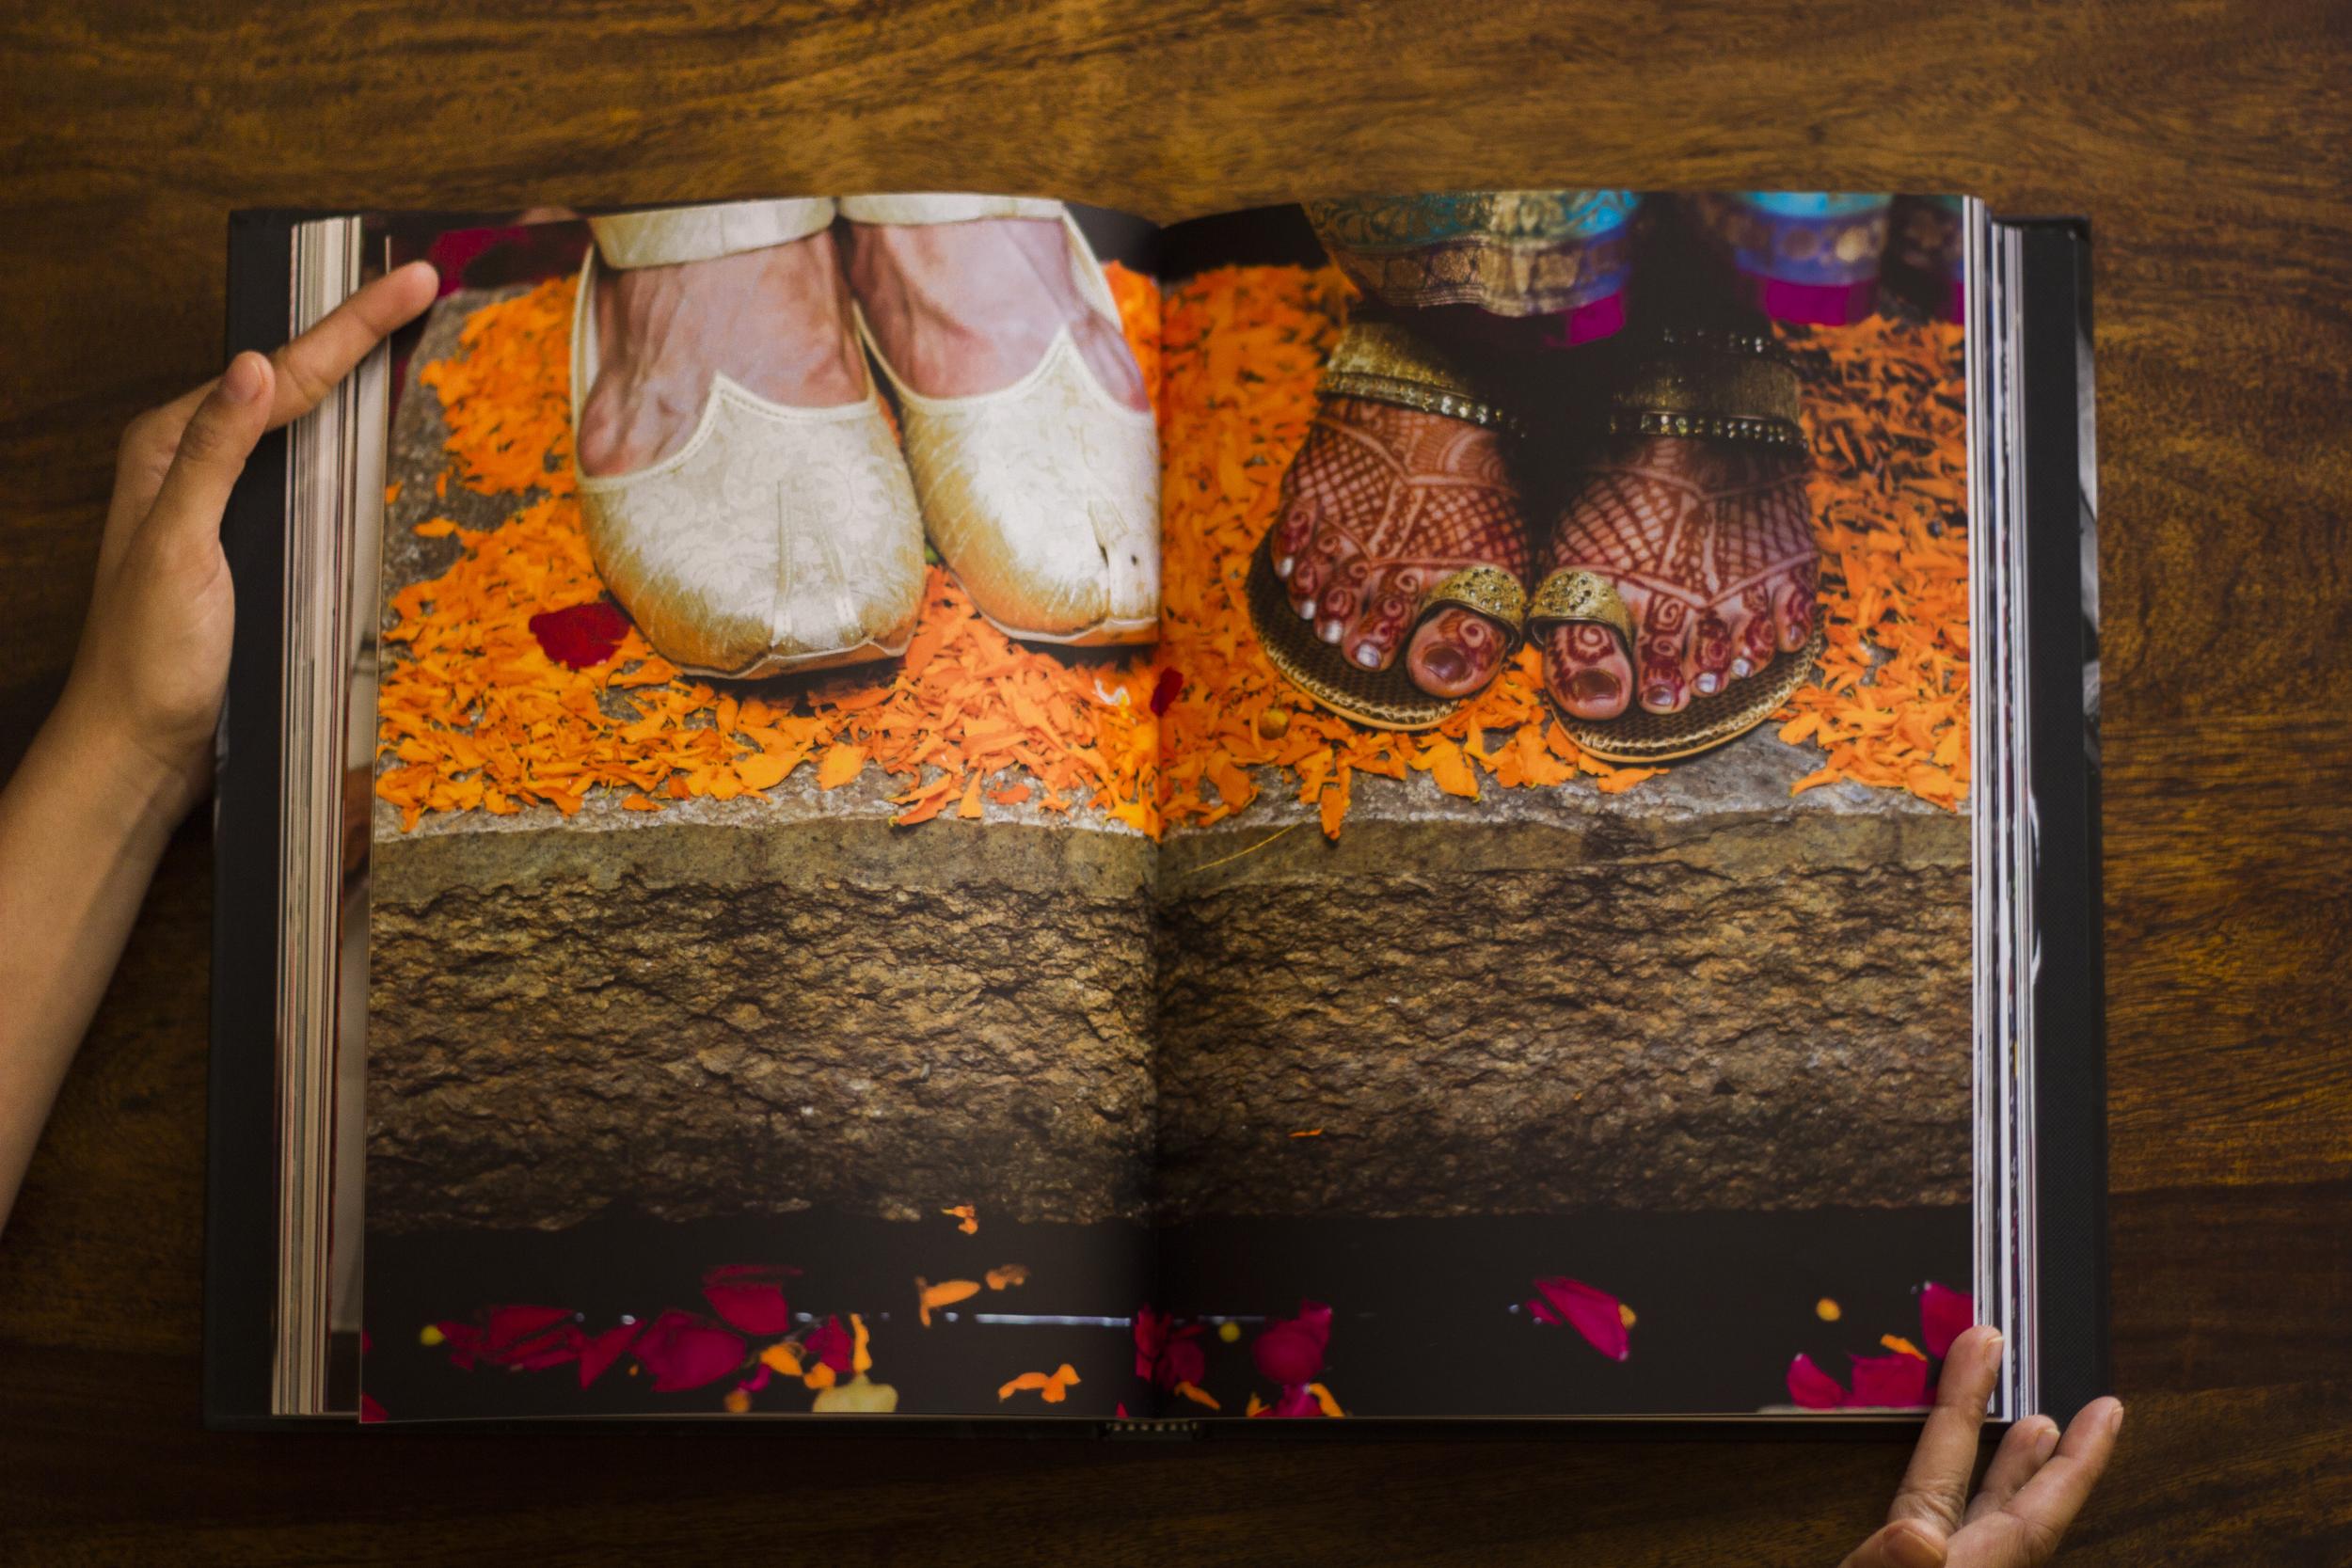 jude_lazaro_weddings_bangalore_india_Photo Book_NRI_Hindu_Muslim_Christian_Candid__4.jpg